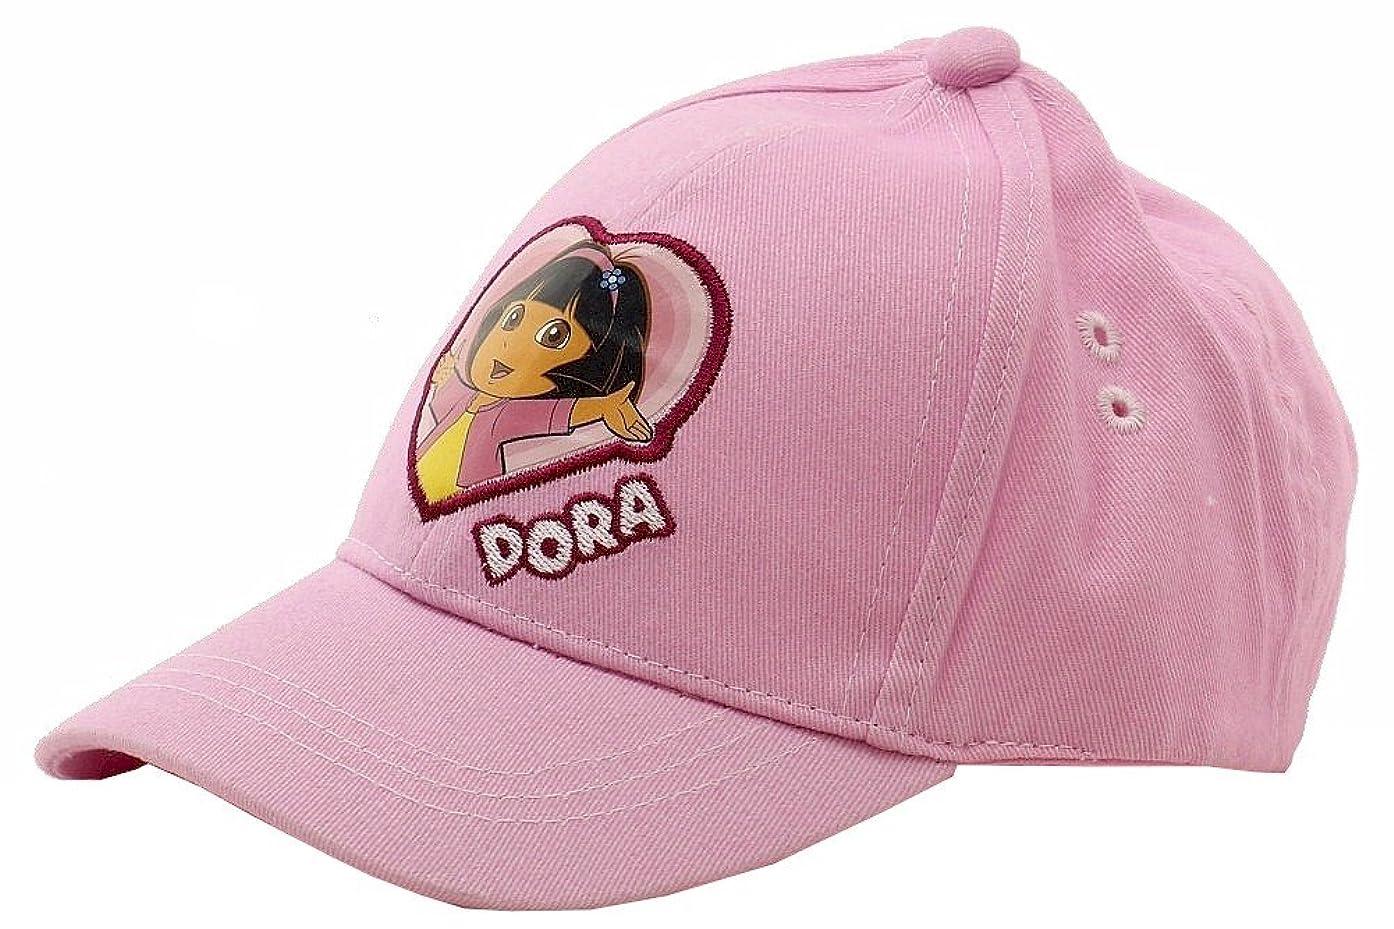 Dora the Explorer Nick Jr Infant Girl's Pink Baseball Cap 0-18 Months